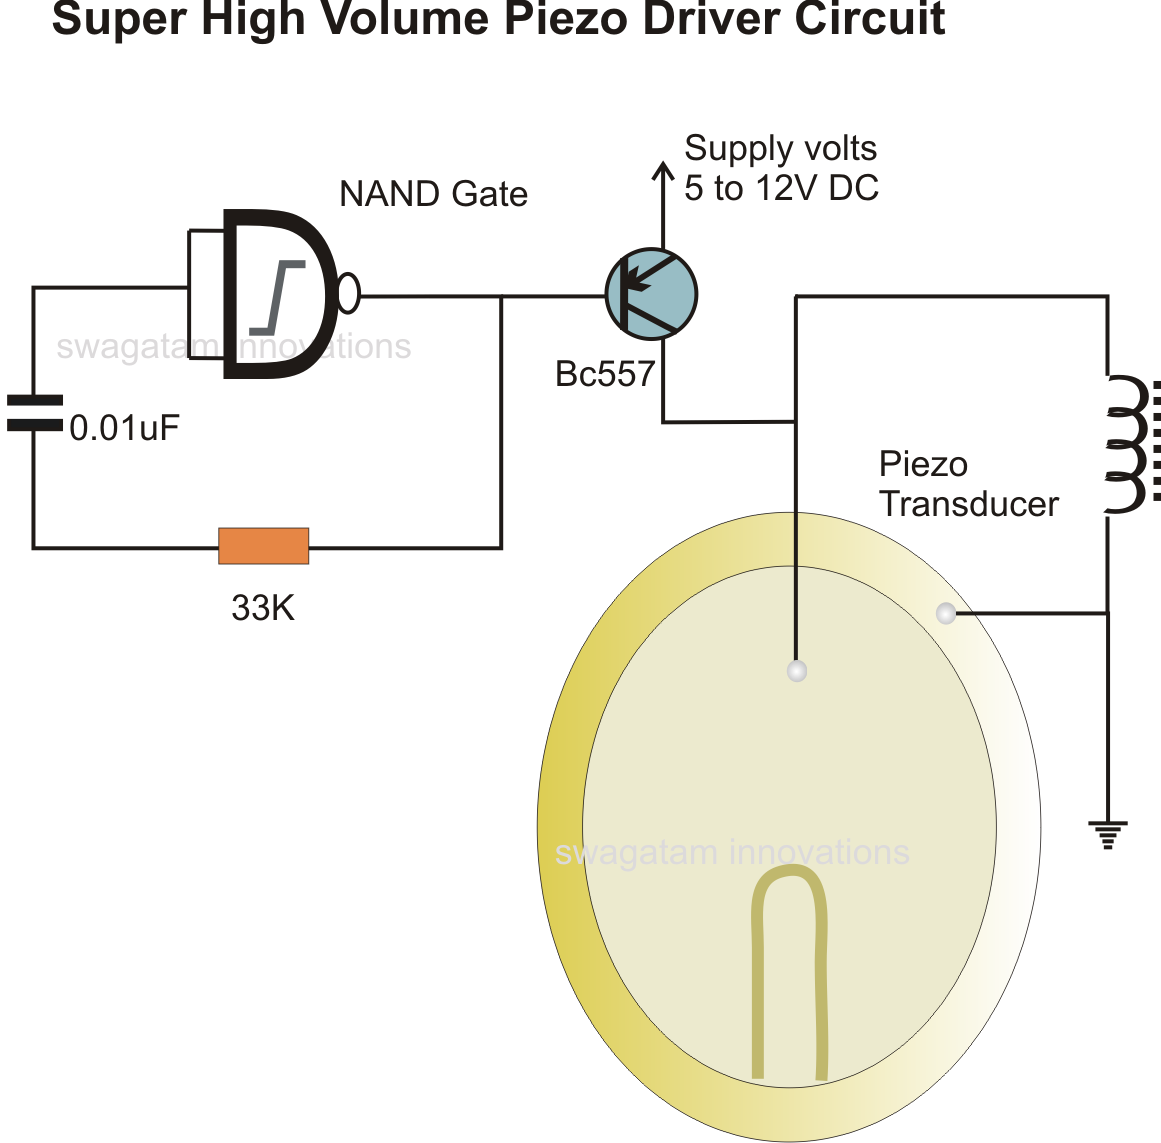 5 watt led driver circuit diagram 2009 club car wiring simplest piezo explained